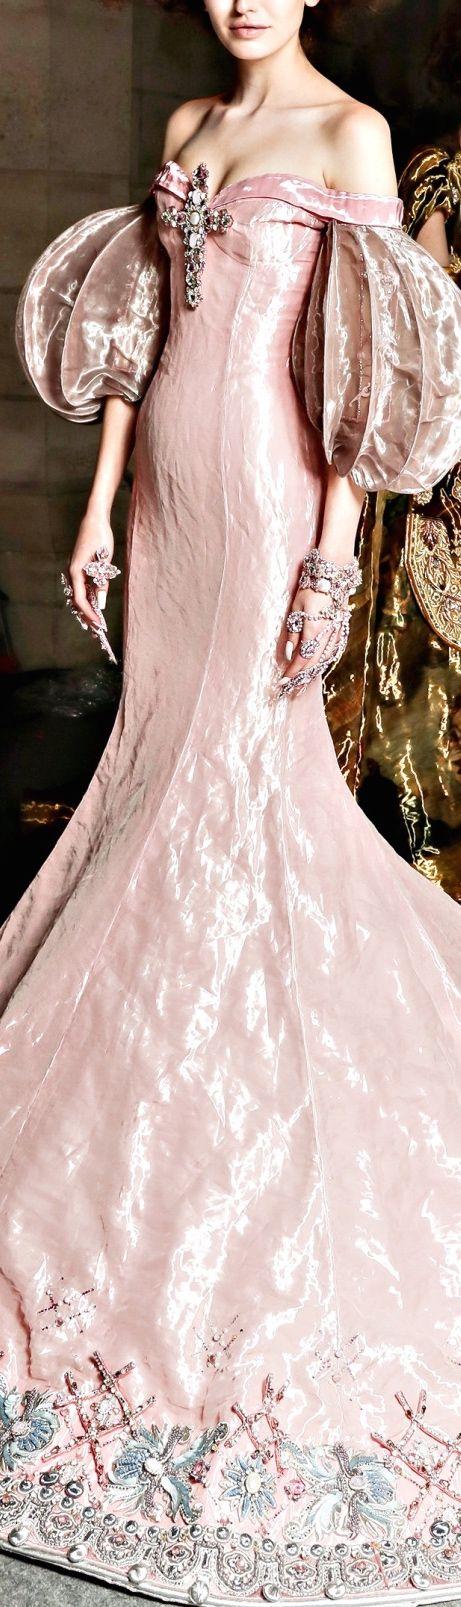 Guo Pei Spring 2017 Couture